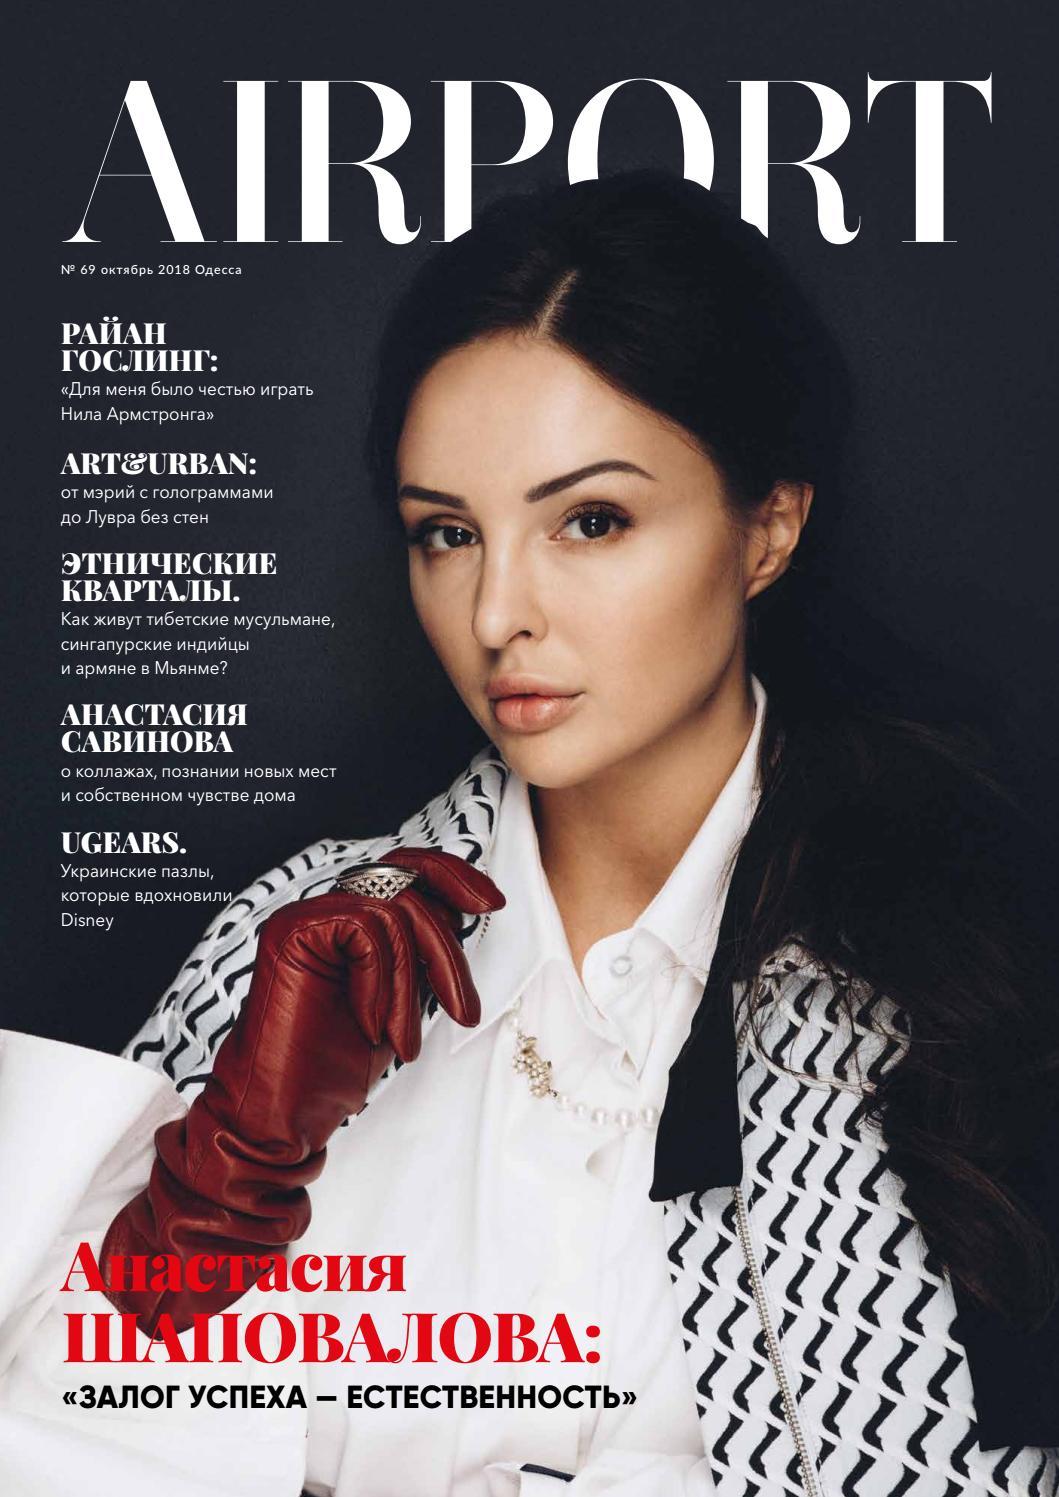 October 18 by Airport Magazine Odessa - issuu 84ba02f1774